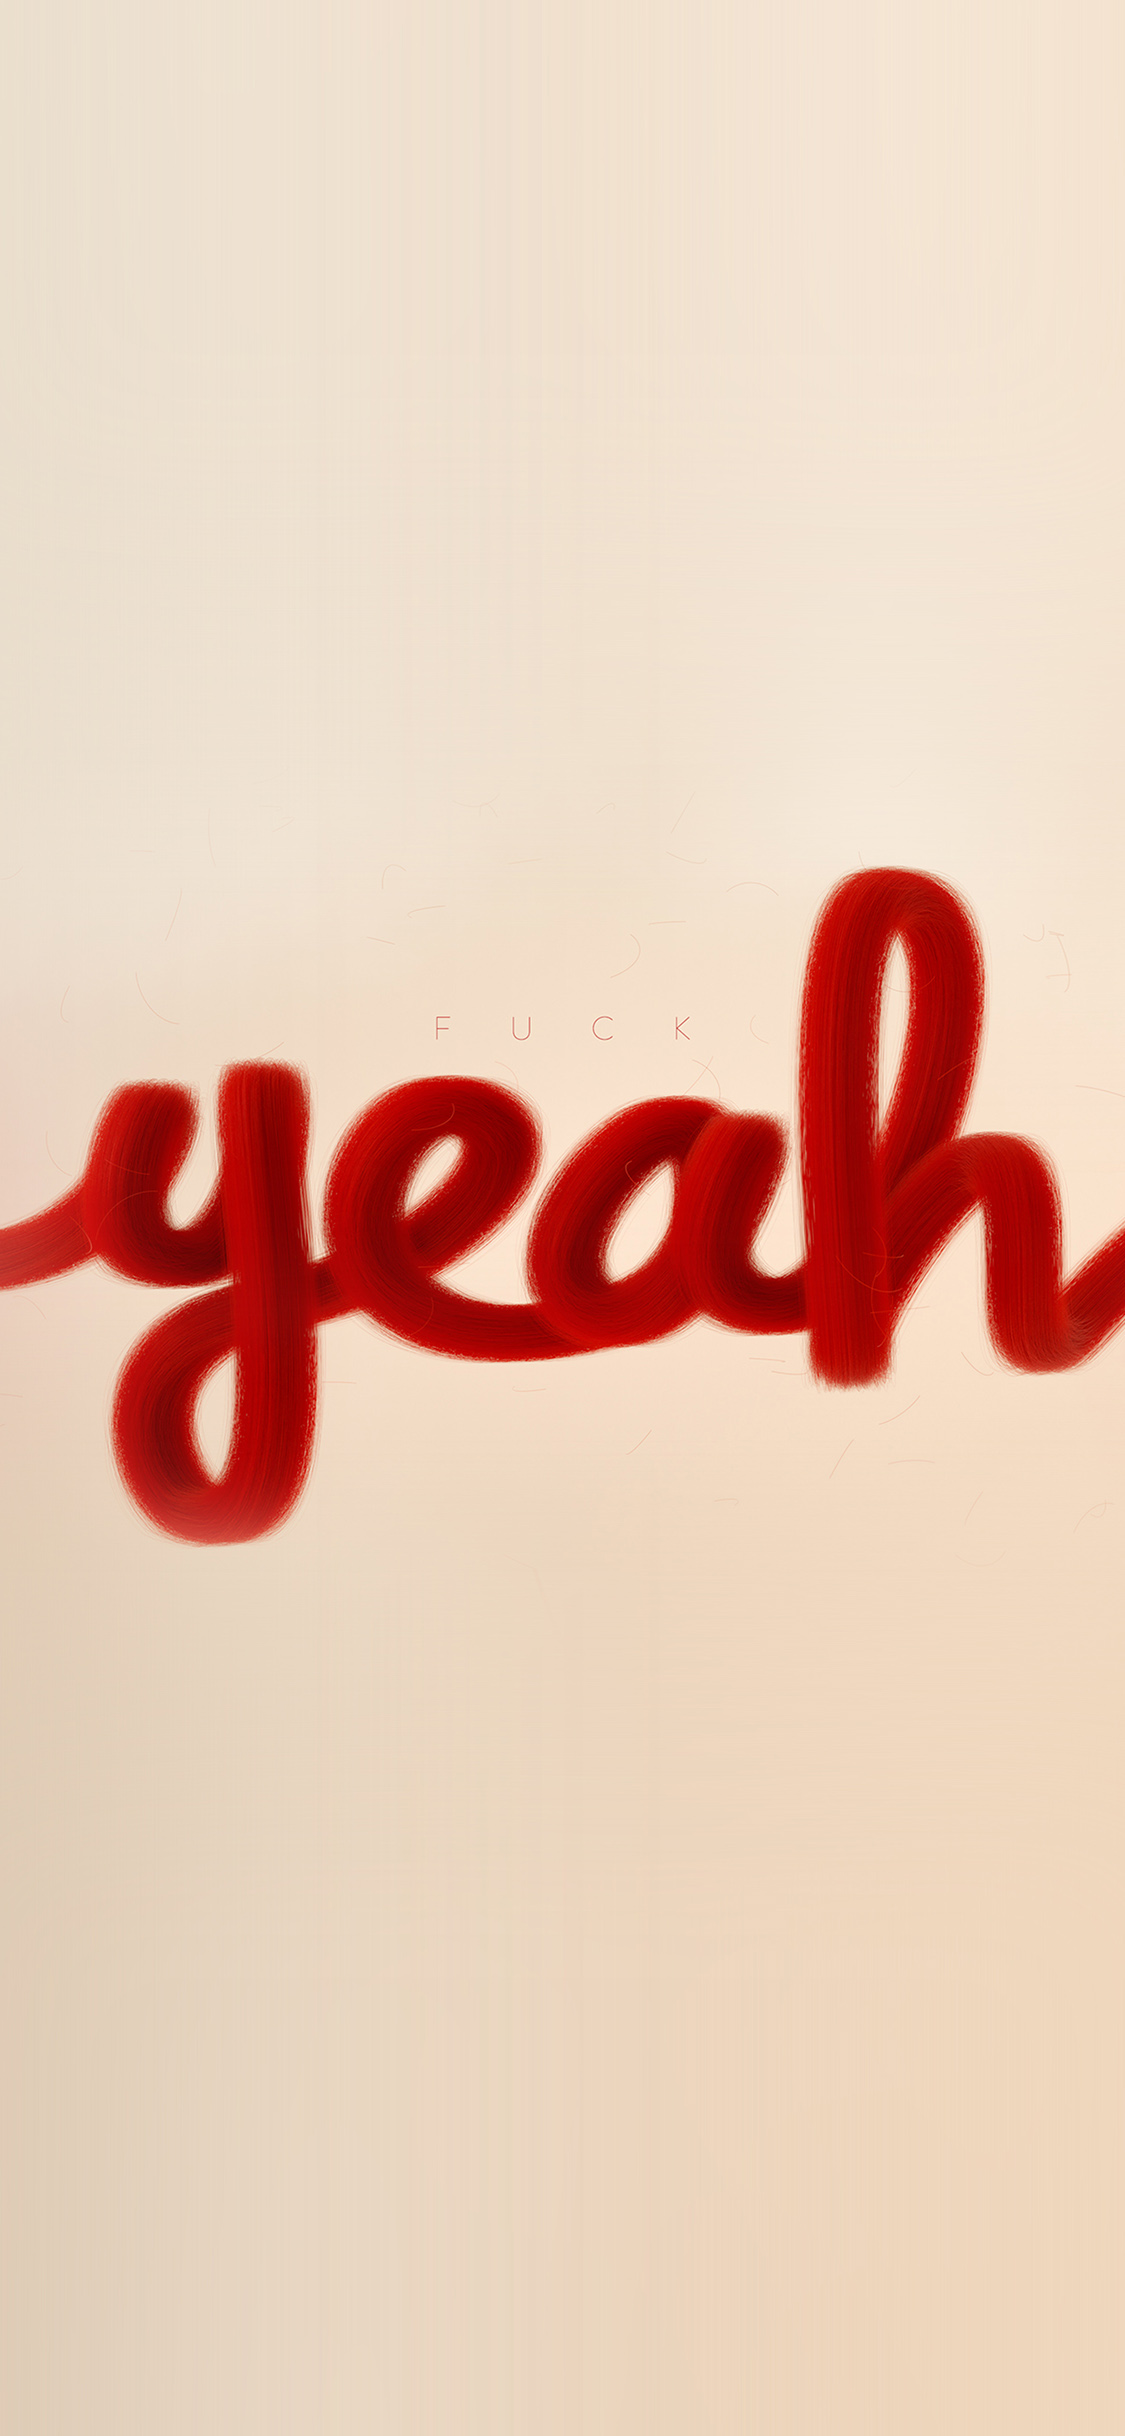 iPhoneXpapers.com-Apple-iPhone-wallpaper-az84-fuck-yeah-red-calligraphy-illustration-art